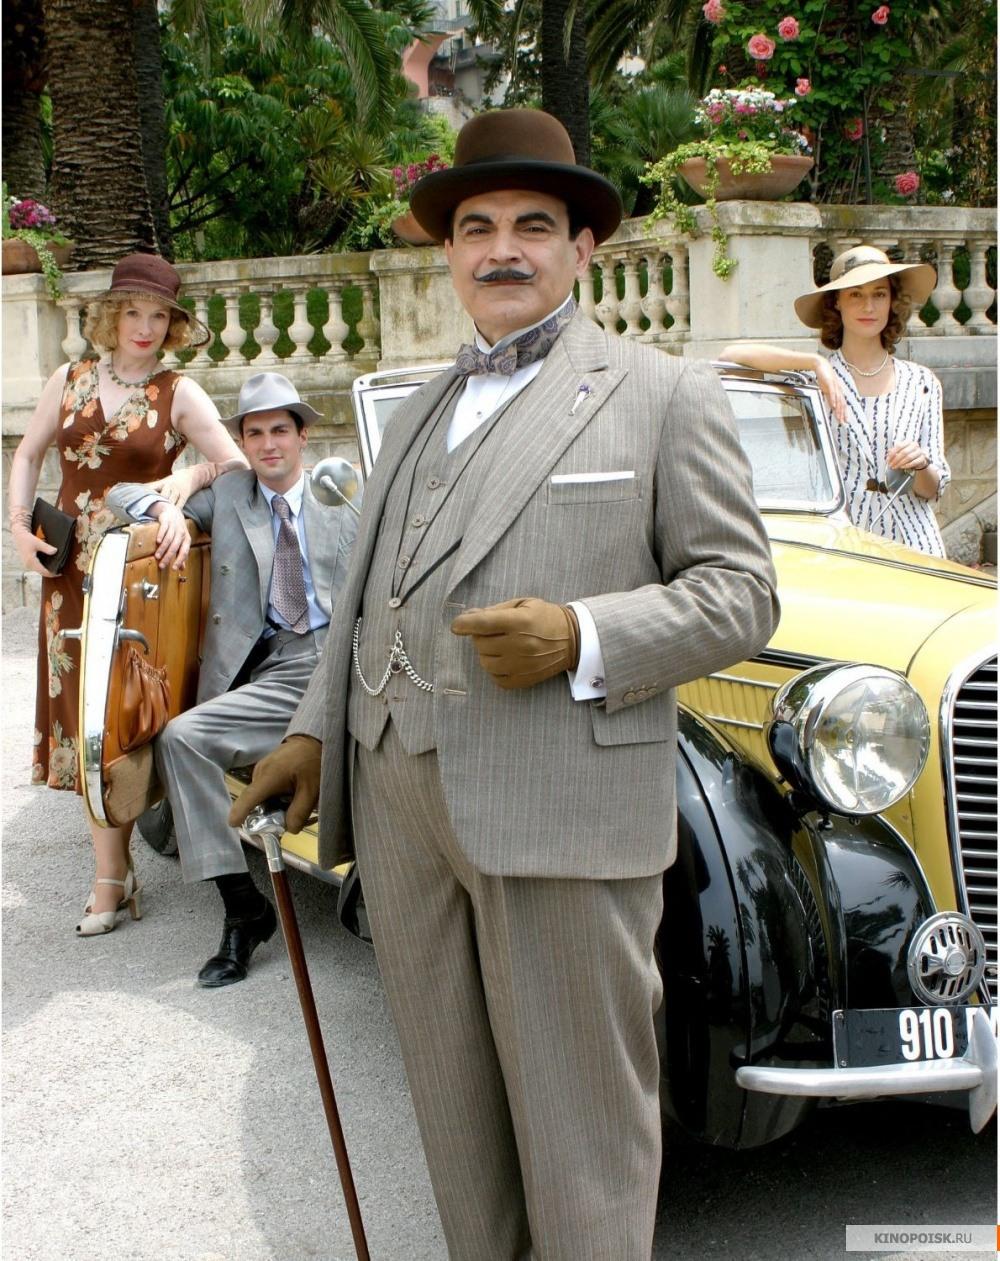 Poirot wedding